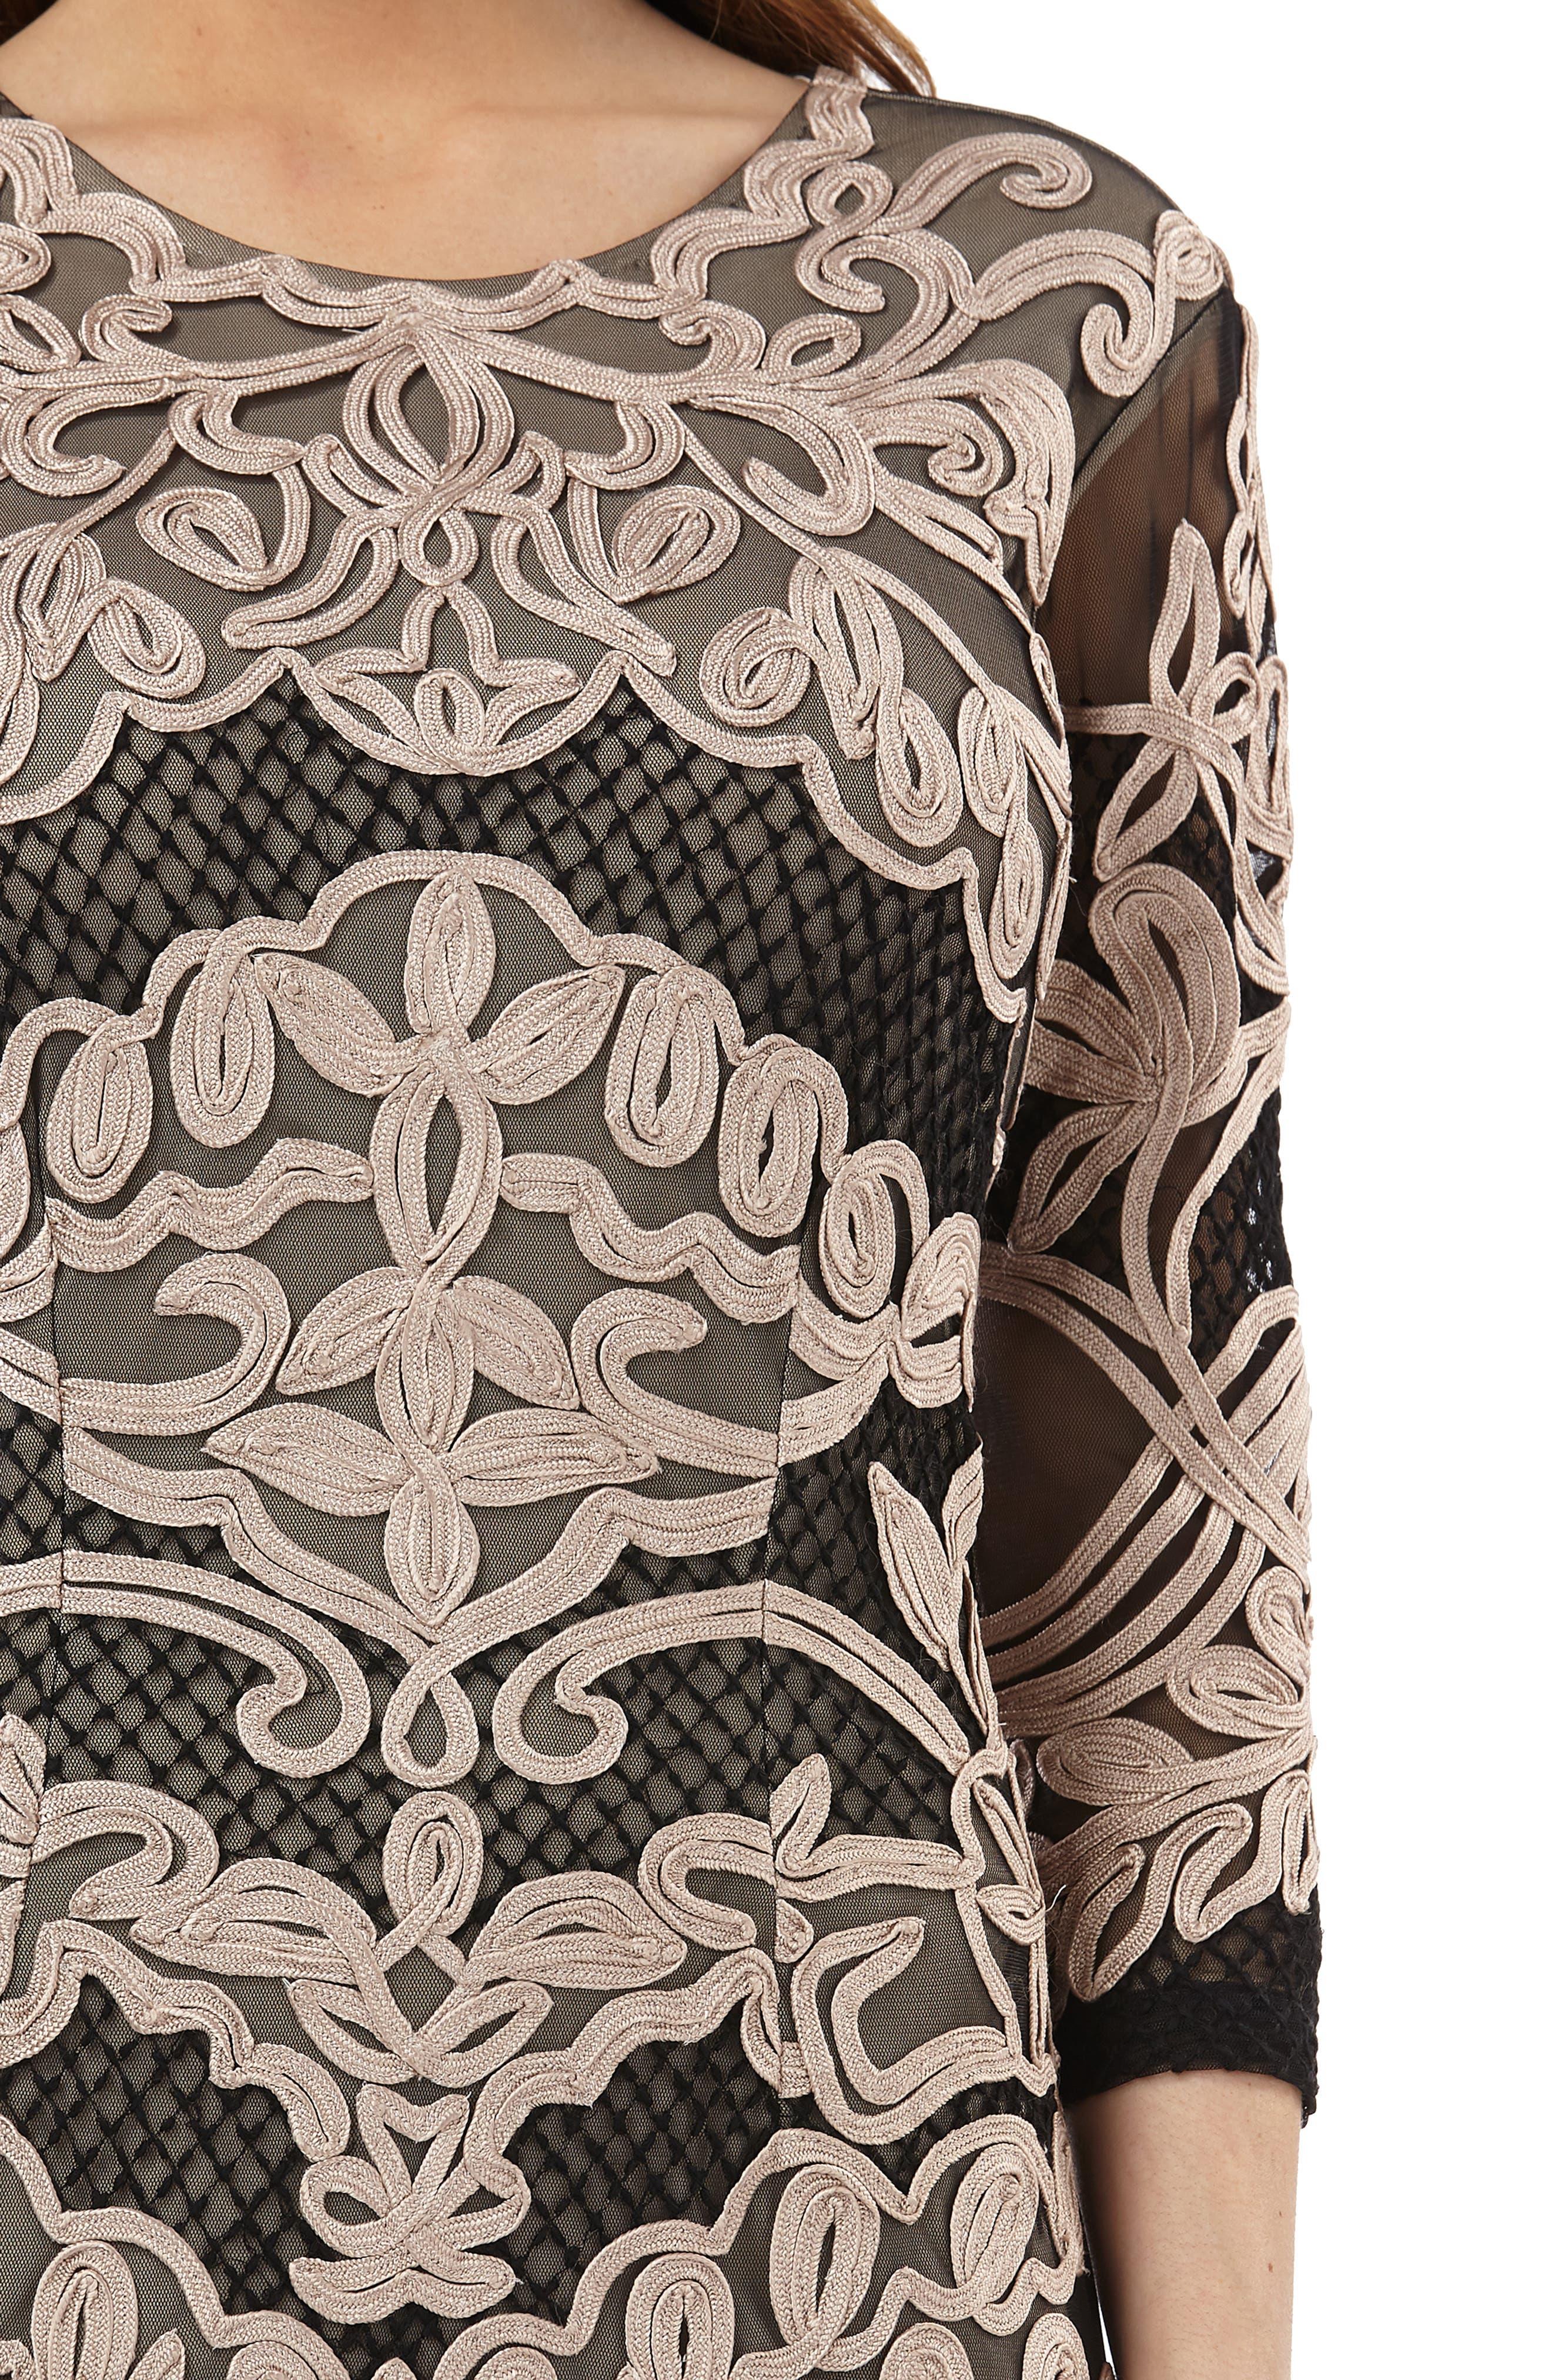 Soutache Sheath Dress,                             Alternate thumbnail 4, color,                             CHAMPAGNE/ BLACK